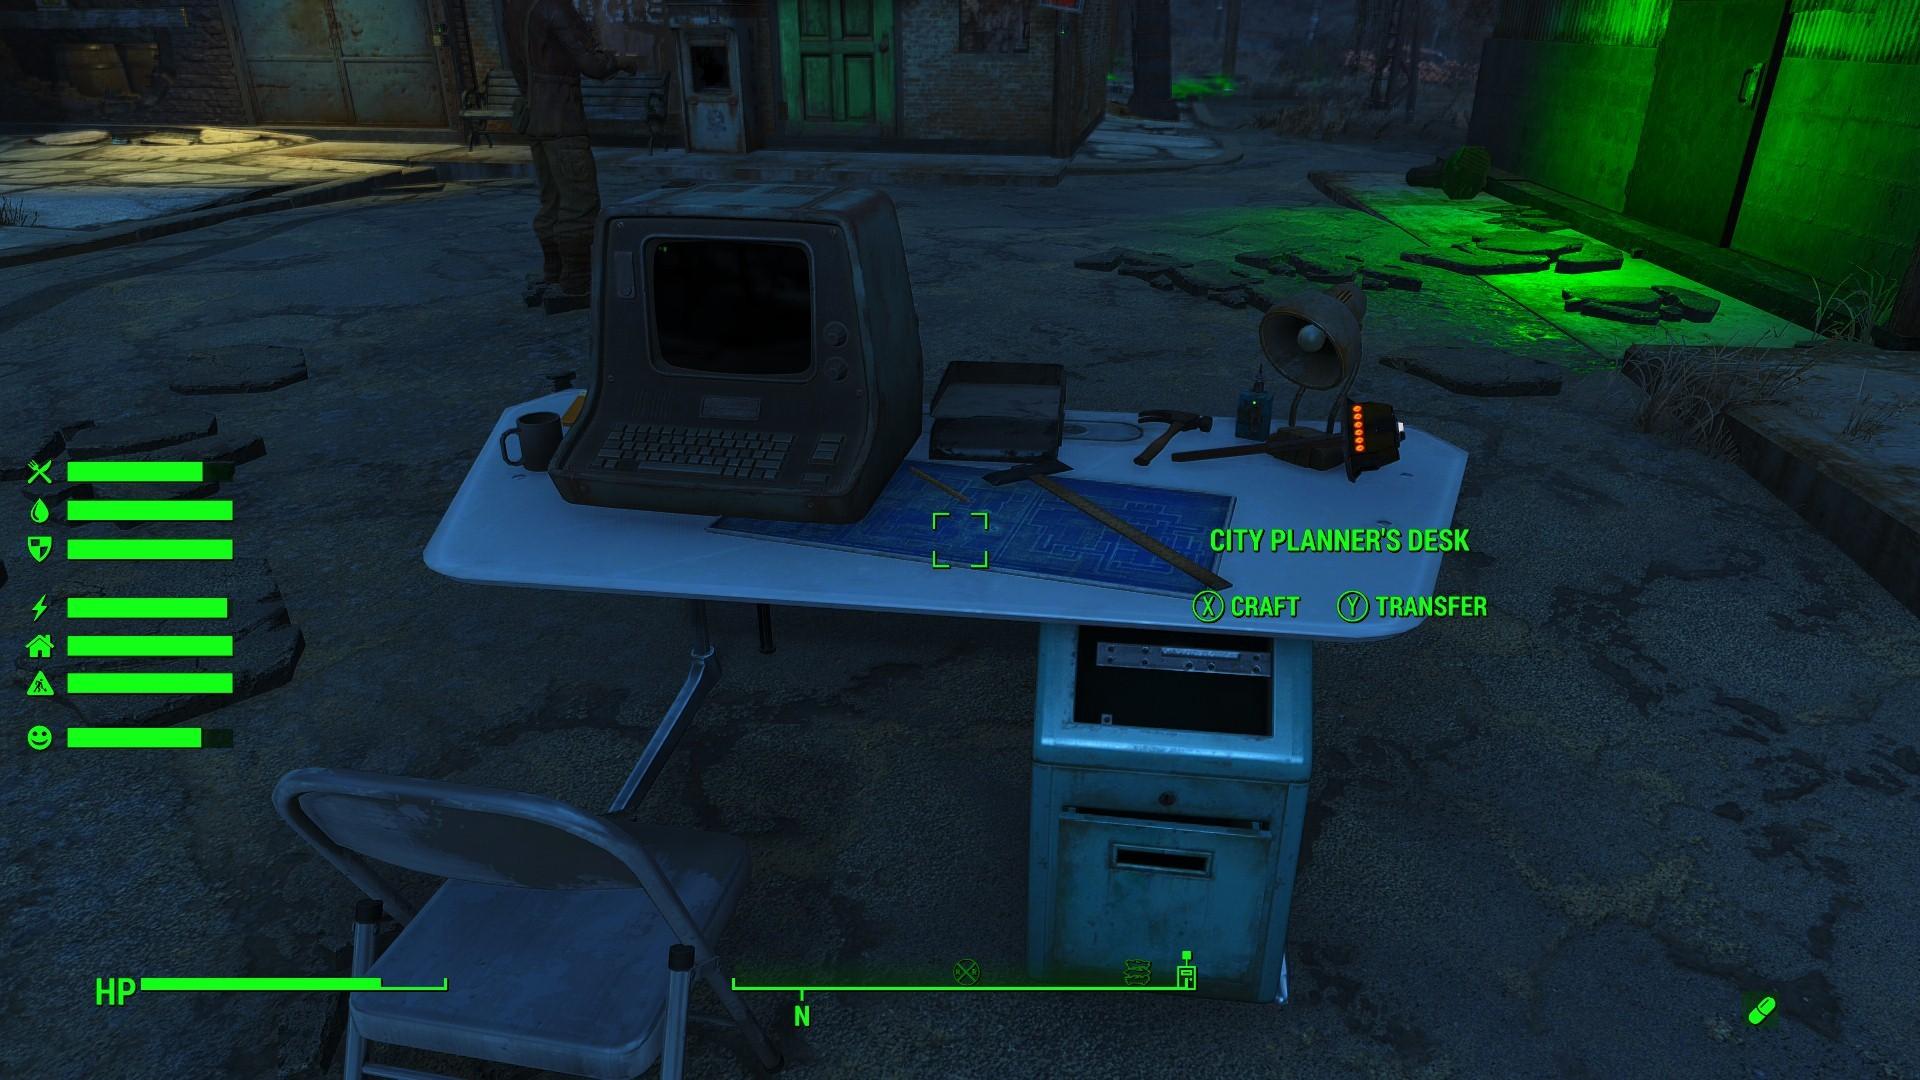 Fallout 4 Sim Settlements - Industrial Revolution Mod Download